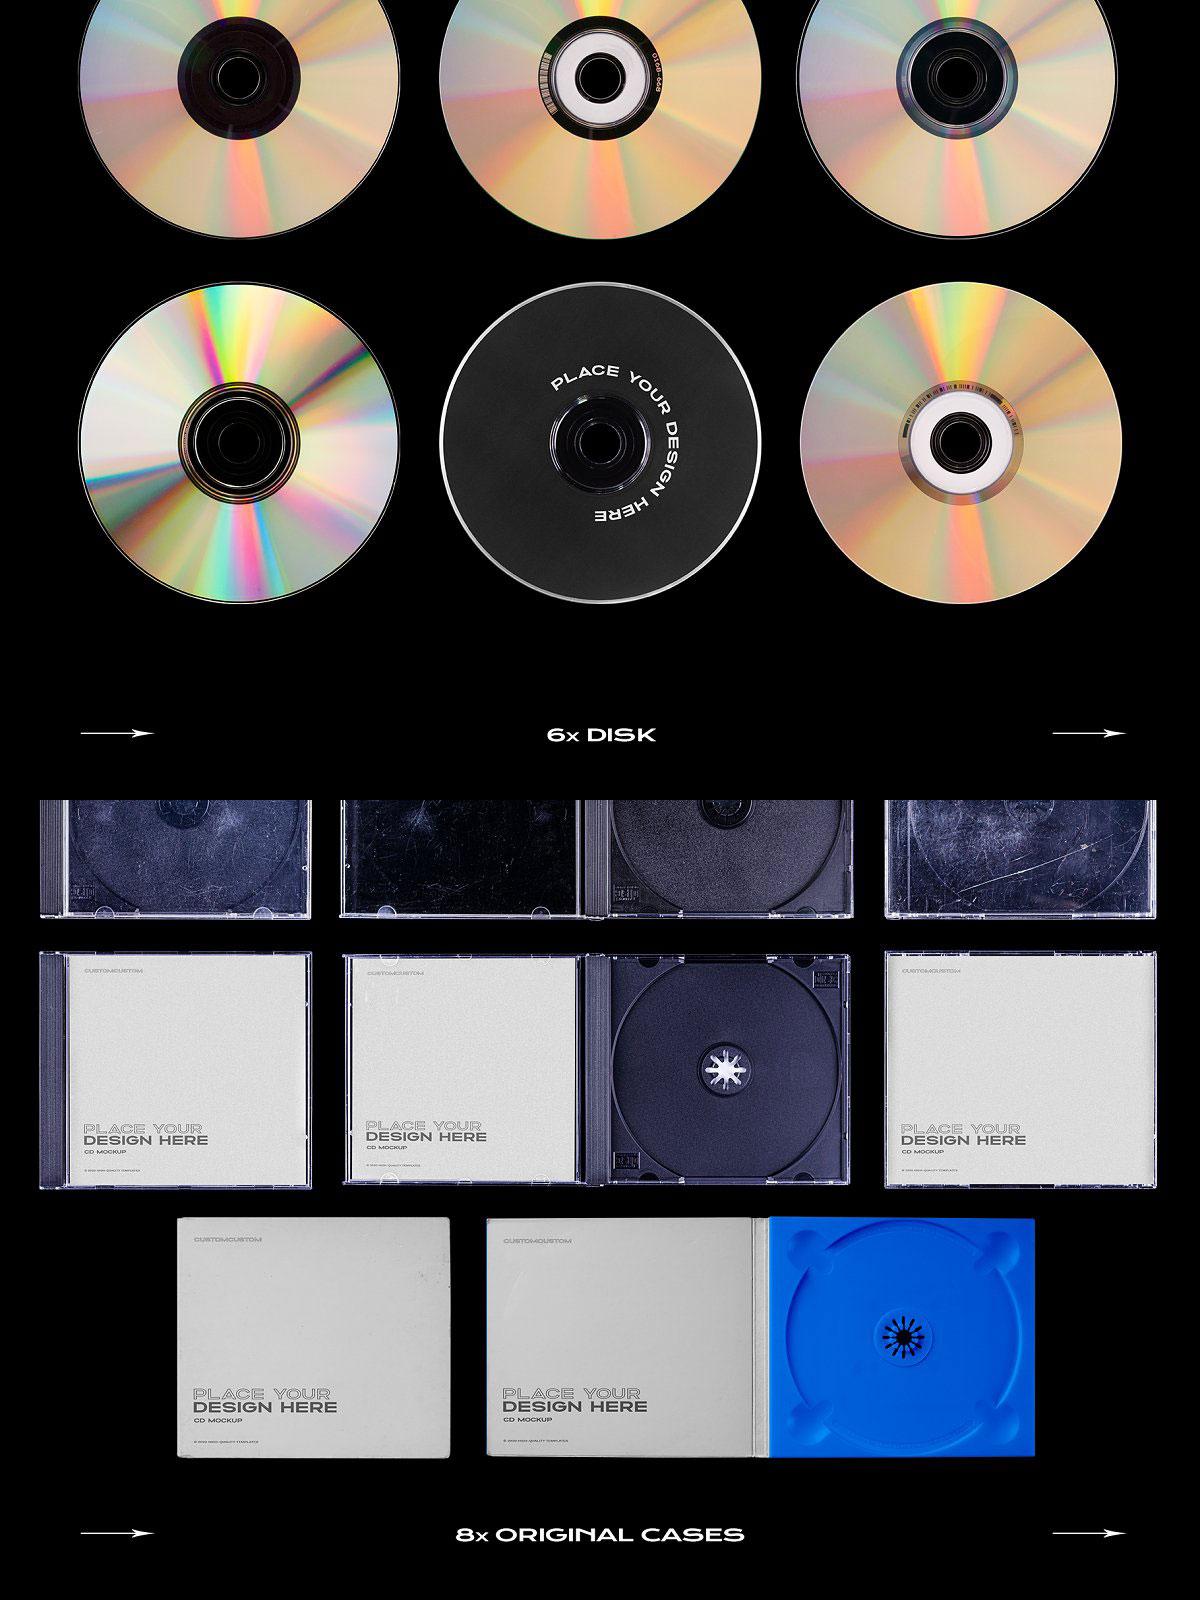 CreativeMarket CD Case Mockup Template Bundle Disc 5319043 Download